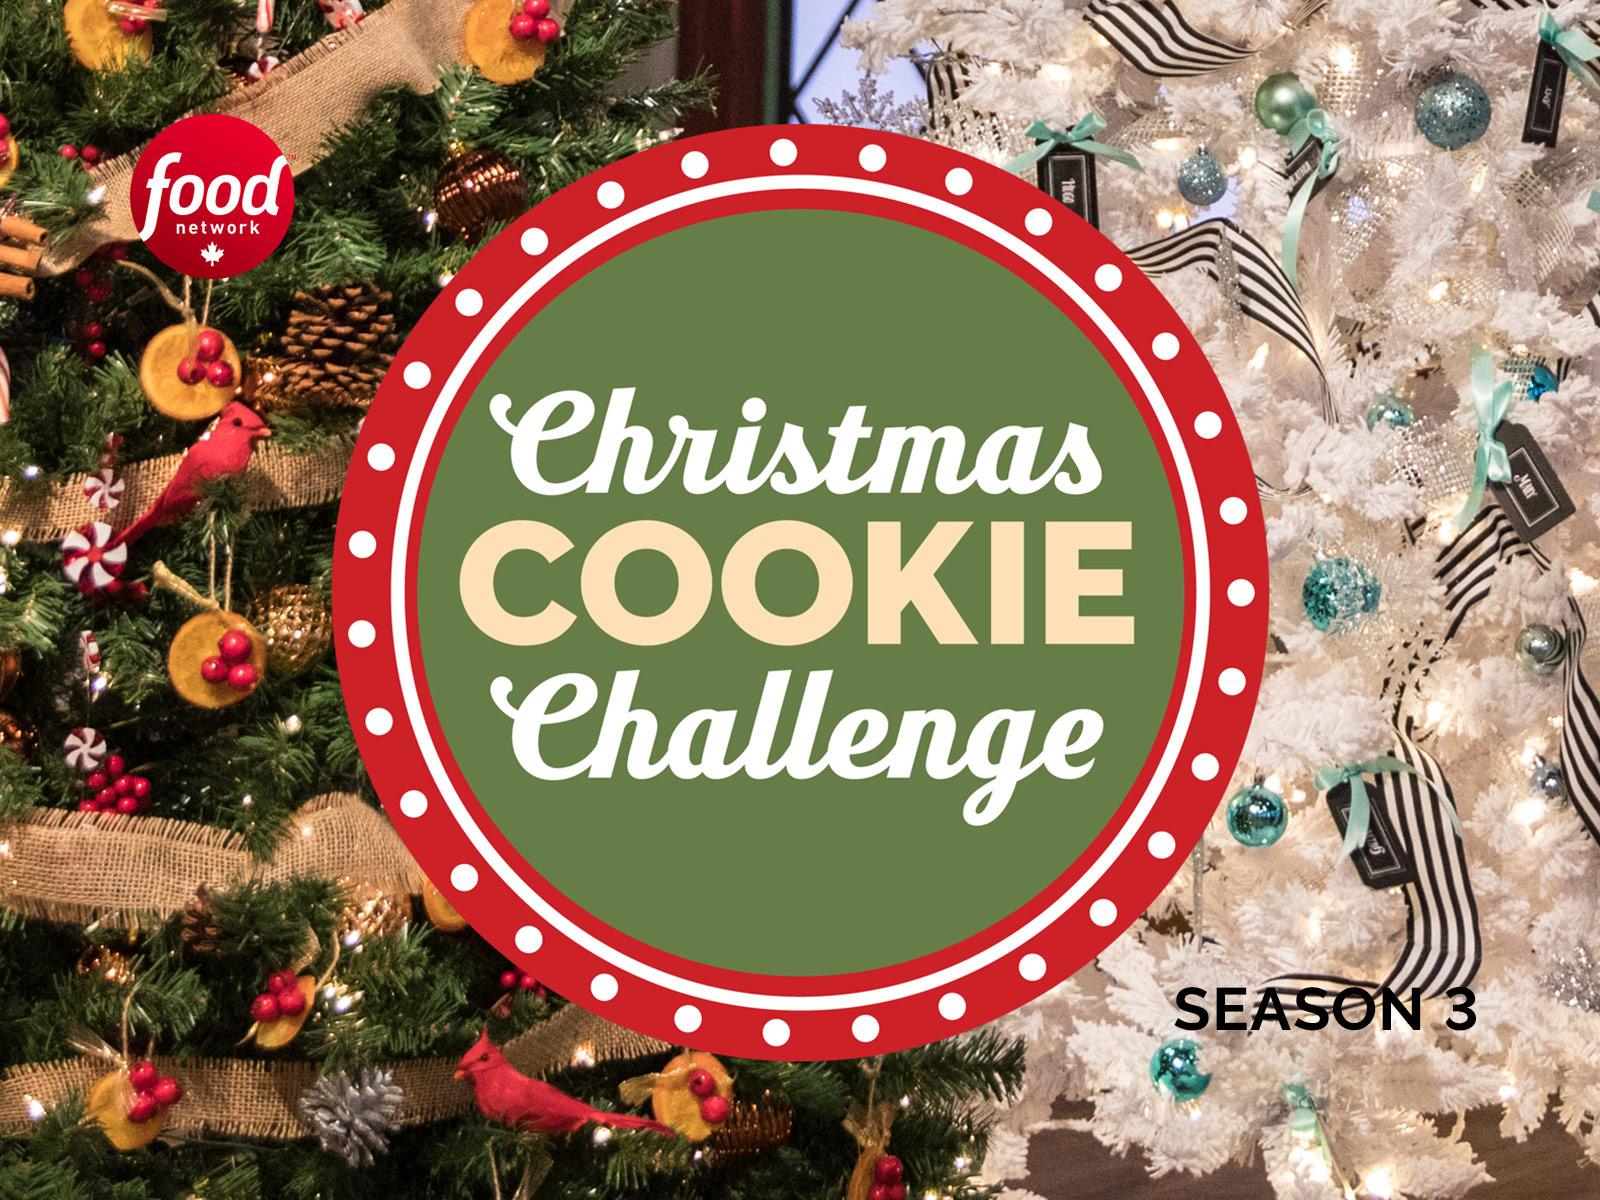 Christmas Cookie Challenge 2021 Judges Prime Video Christmas Cookie Challenge Season 2